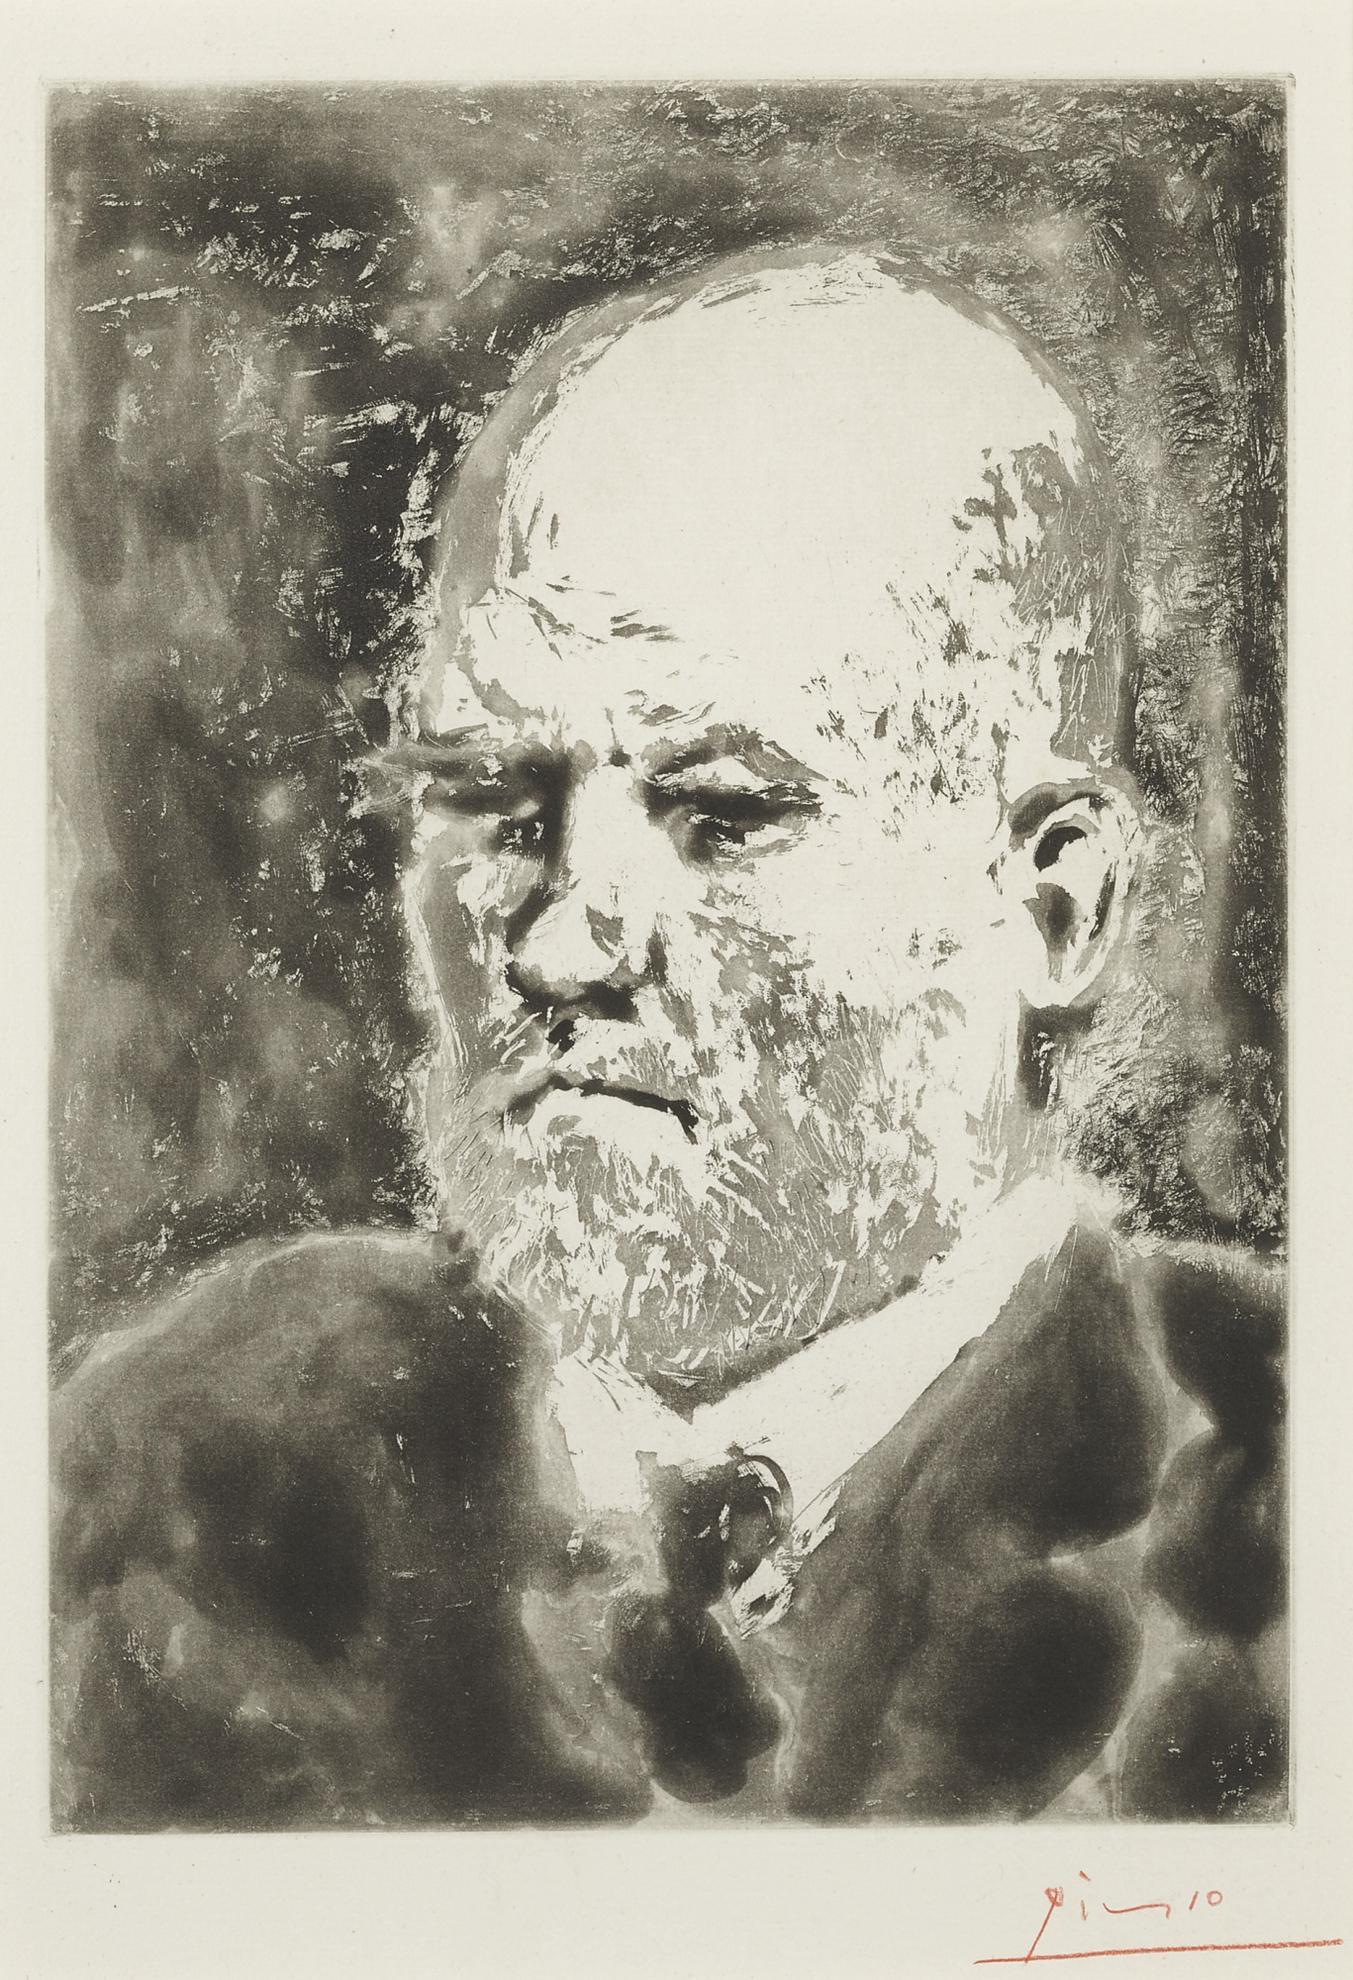 Pablo Picasso-Portrait De Vollard I (B. 232; Ba. 617)-1937